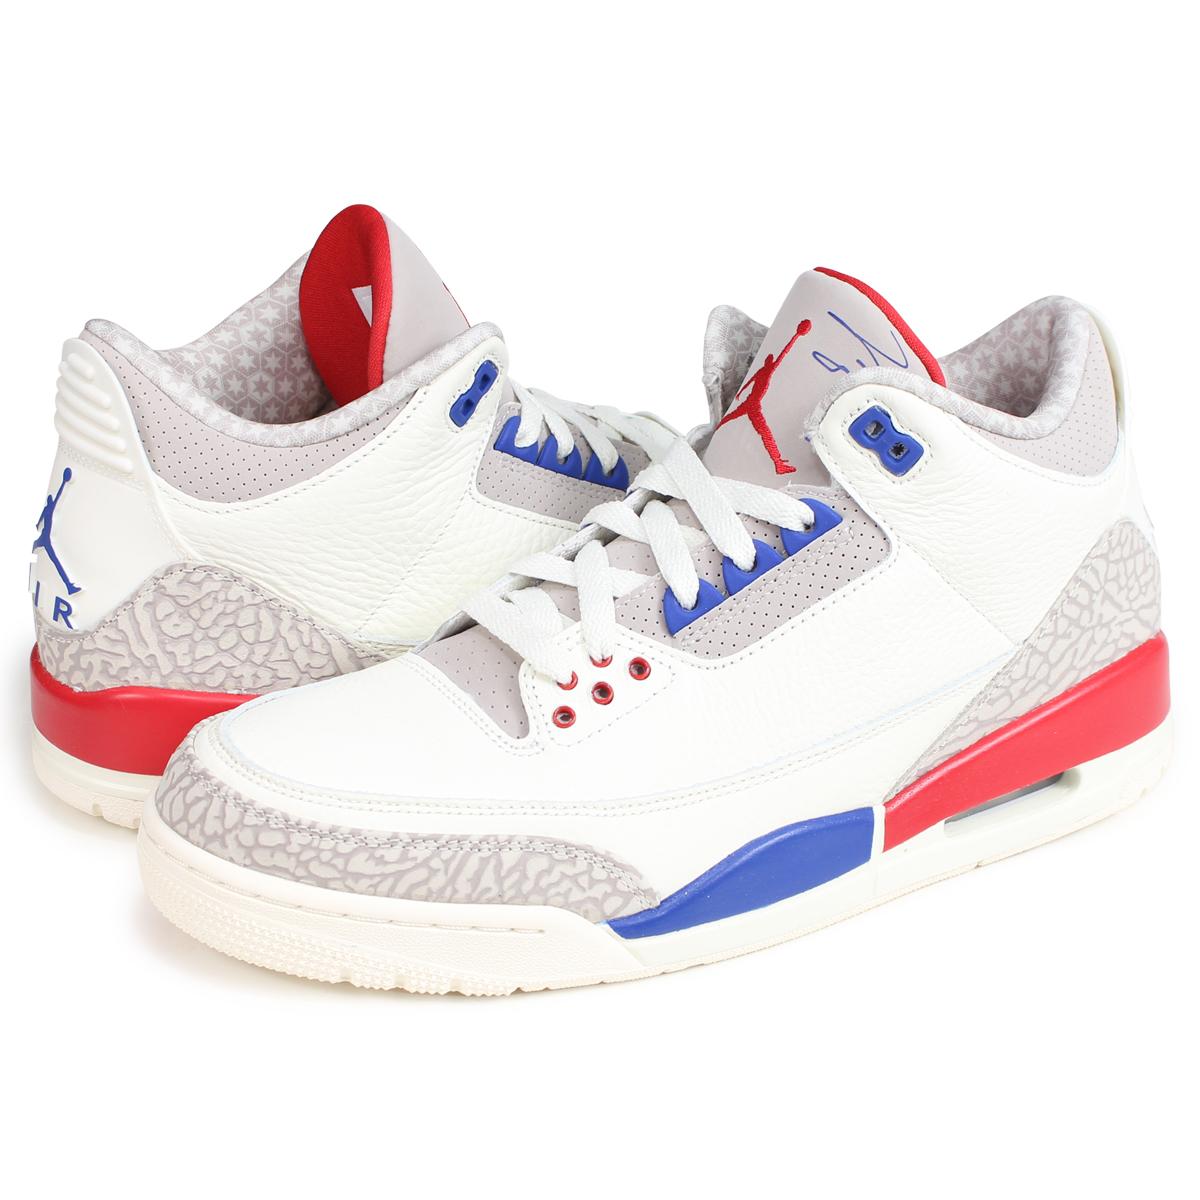 wholesale dealer d5e84 0e032 NIKE AIR JORDAN 3 RETRO Nike Air Jordan 3 nostalgic sneakers men 36,064-140  white  load planned Shinnyu load in reservation product 9 10 containing